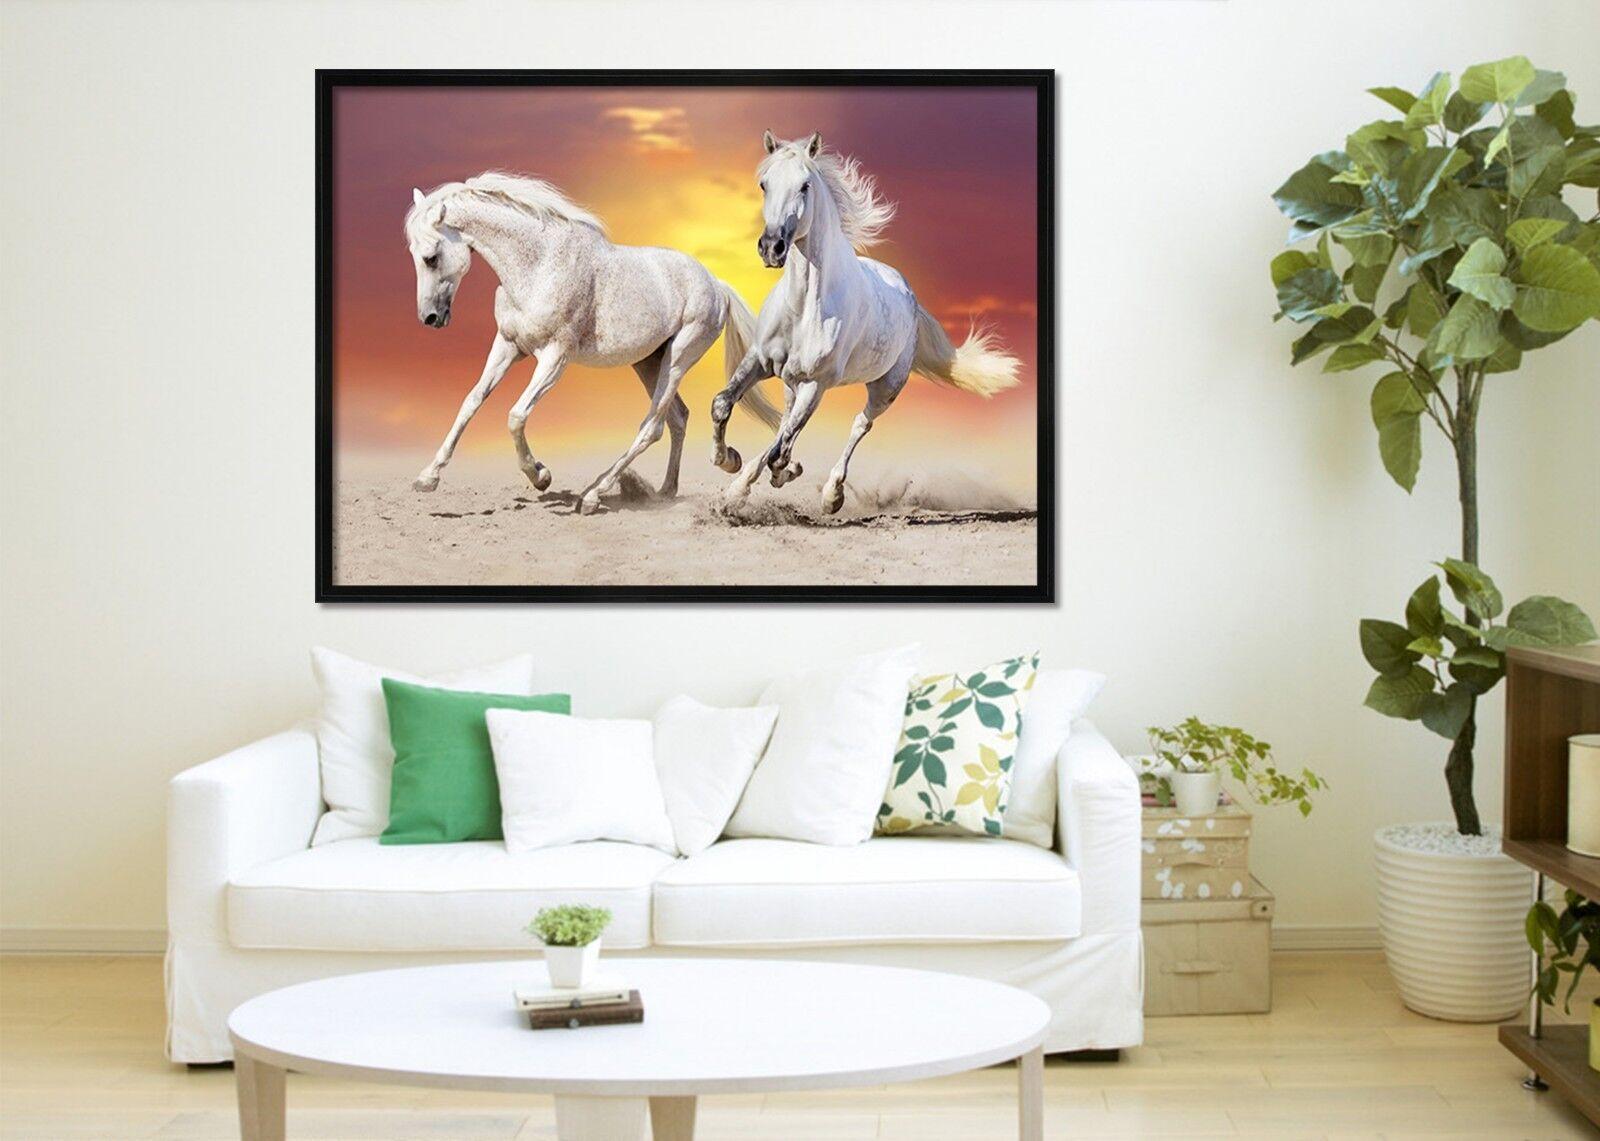 3D anochecer tierra caballos 2 Enmarcado Cartel Decoración del Hogar Pintura de Impresión Arte AJ Wallpaper